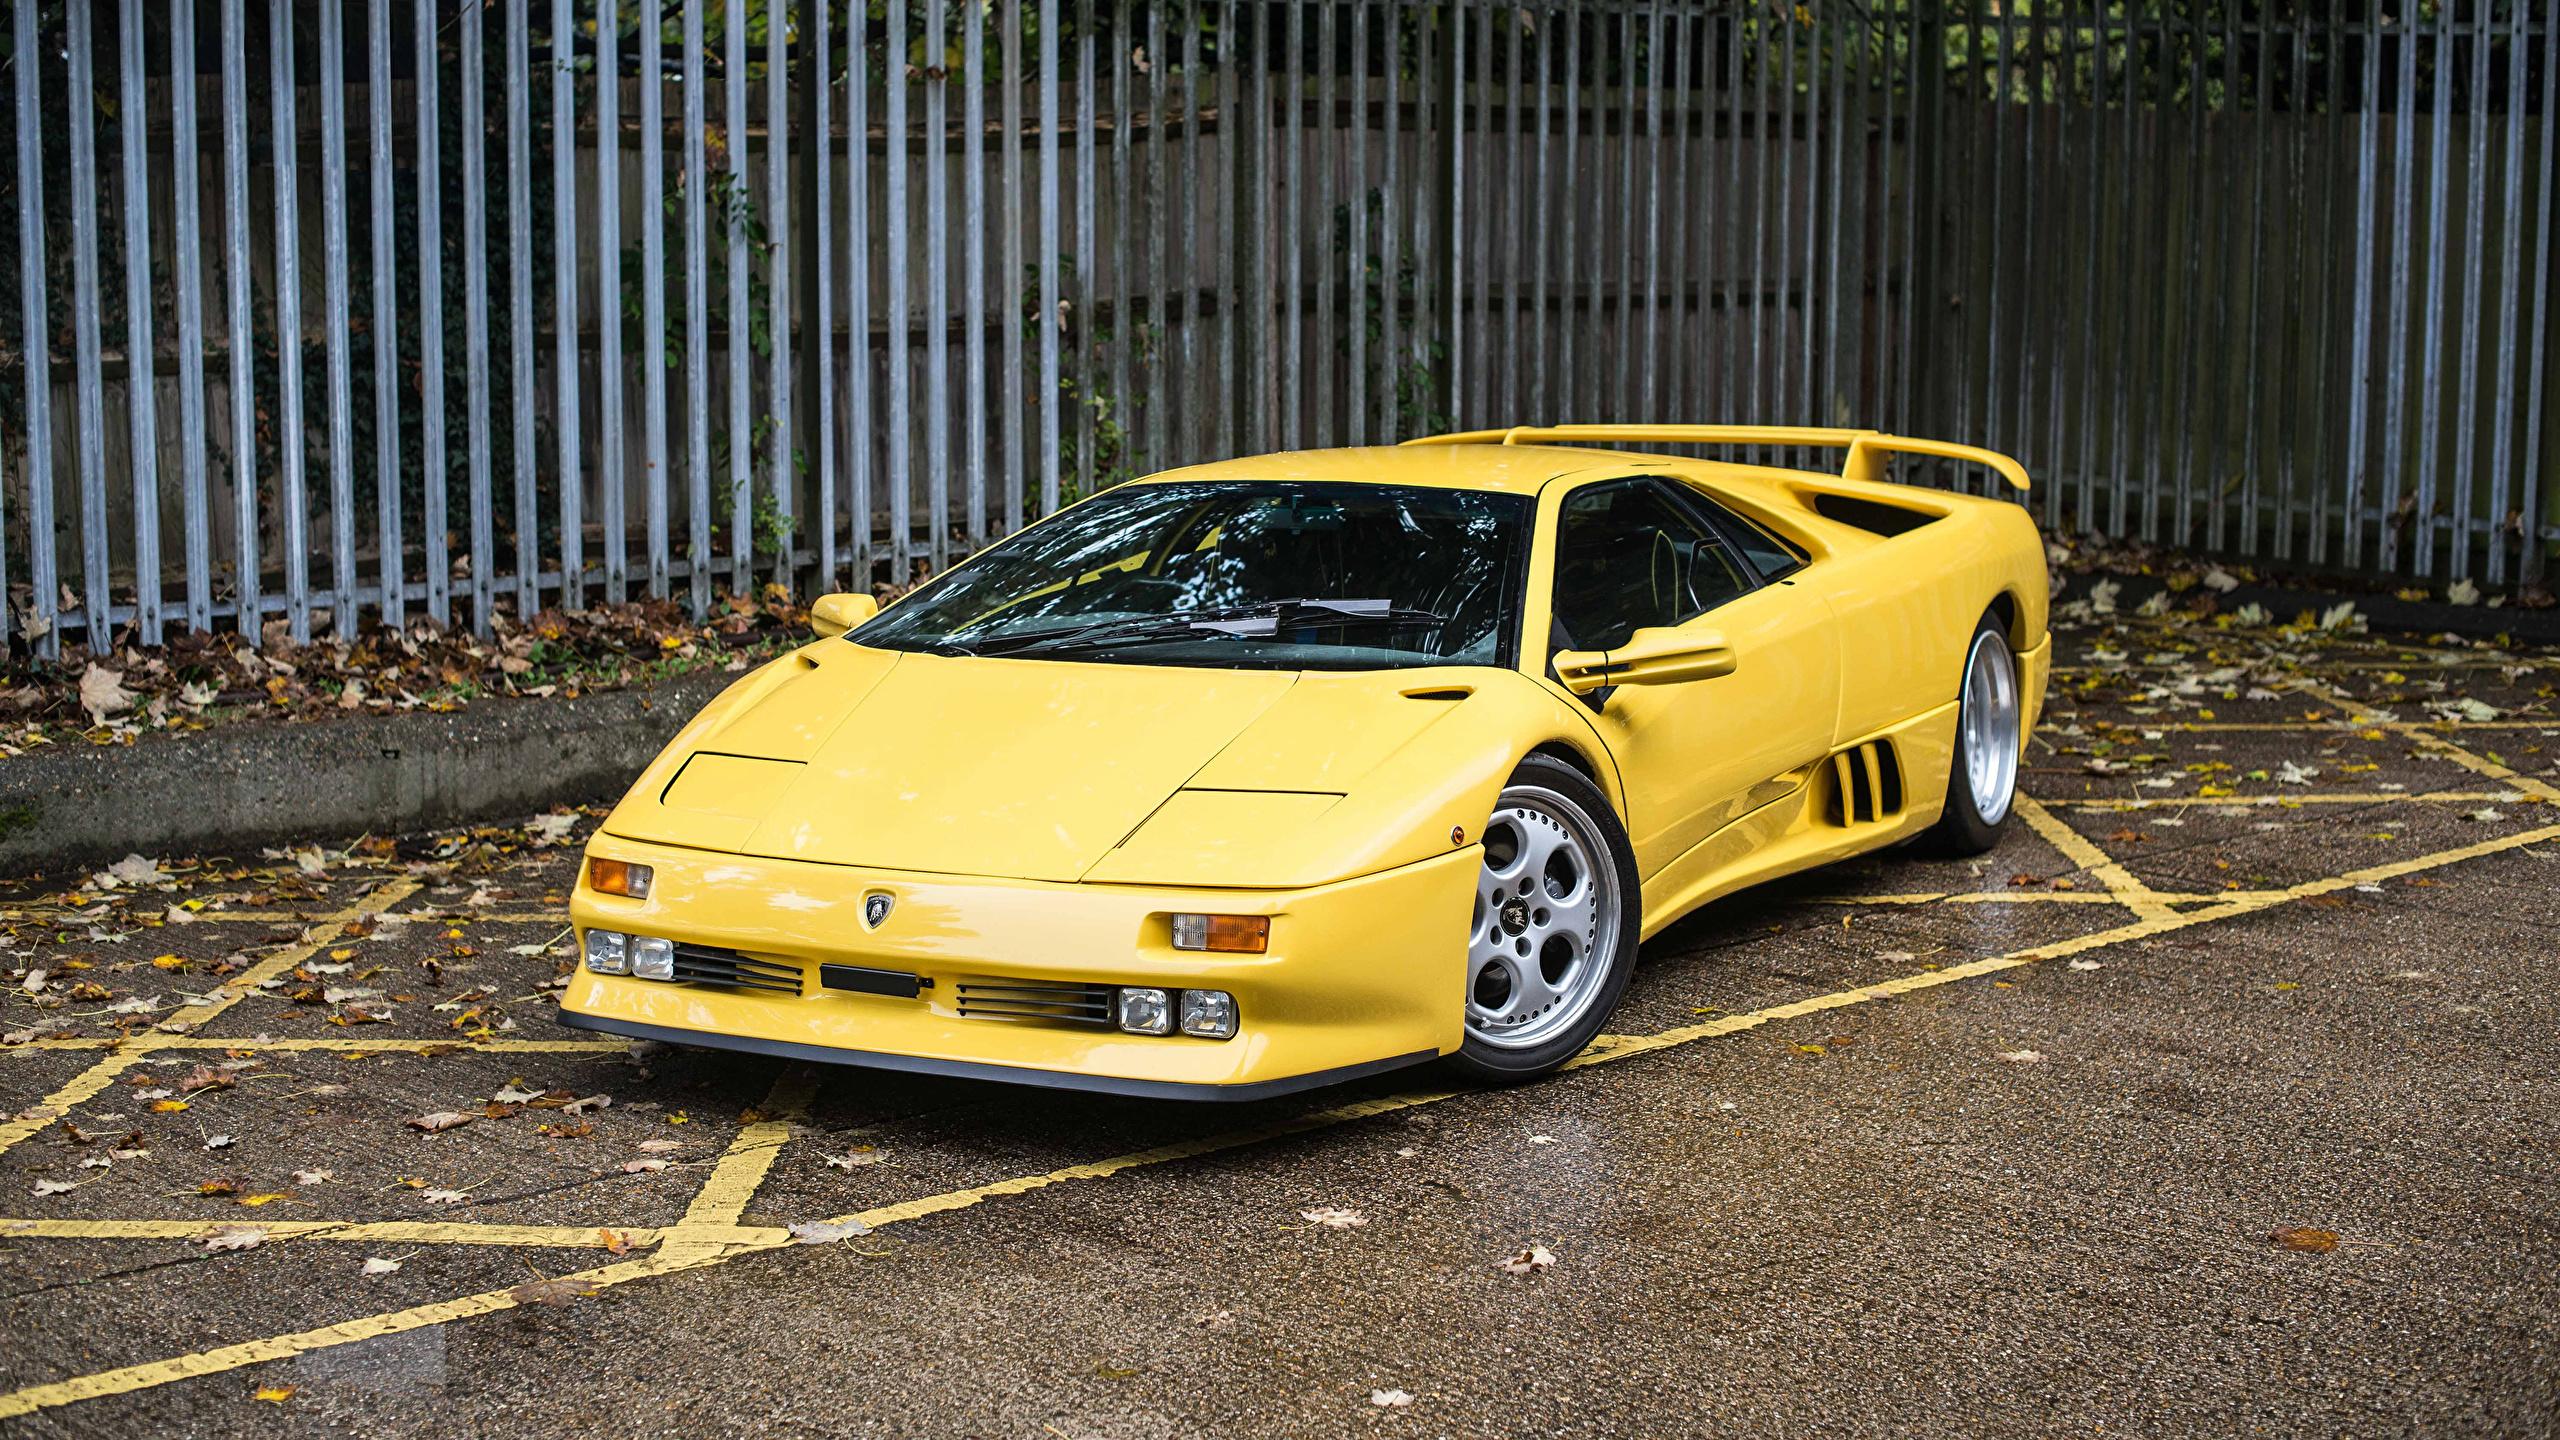 Images Lamborghini 1994 95 Diablo Se30 Yellow Vintage Cars 2560x1440